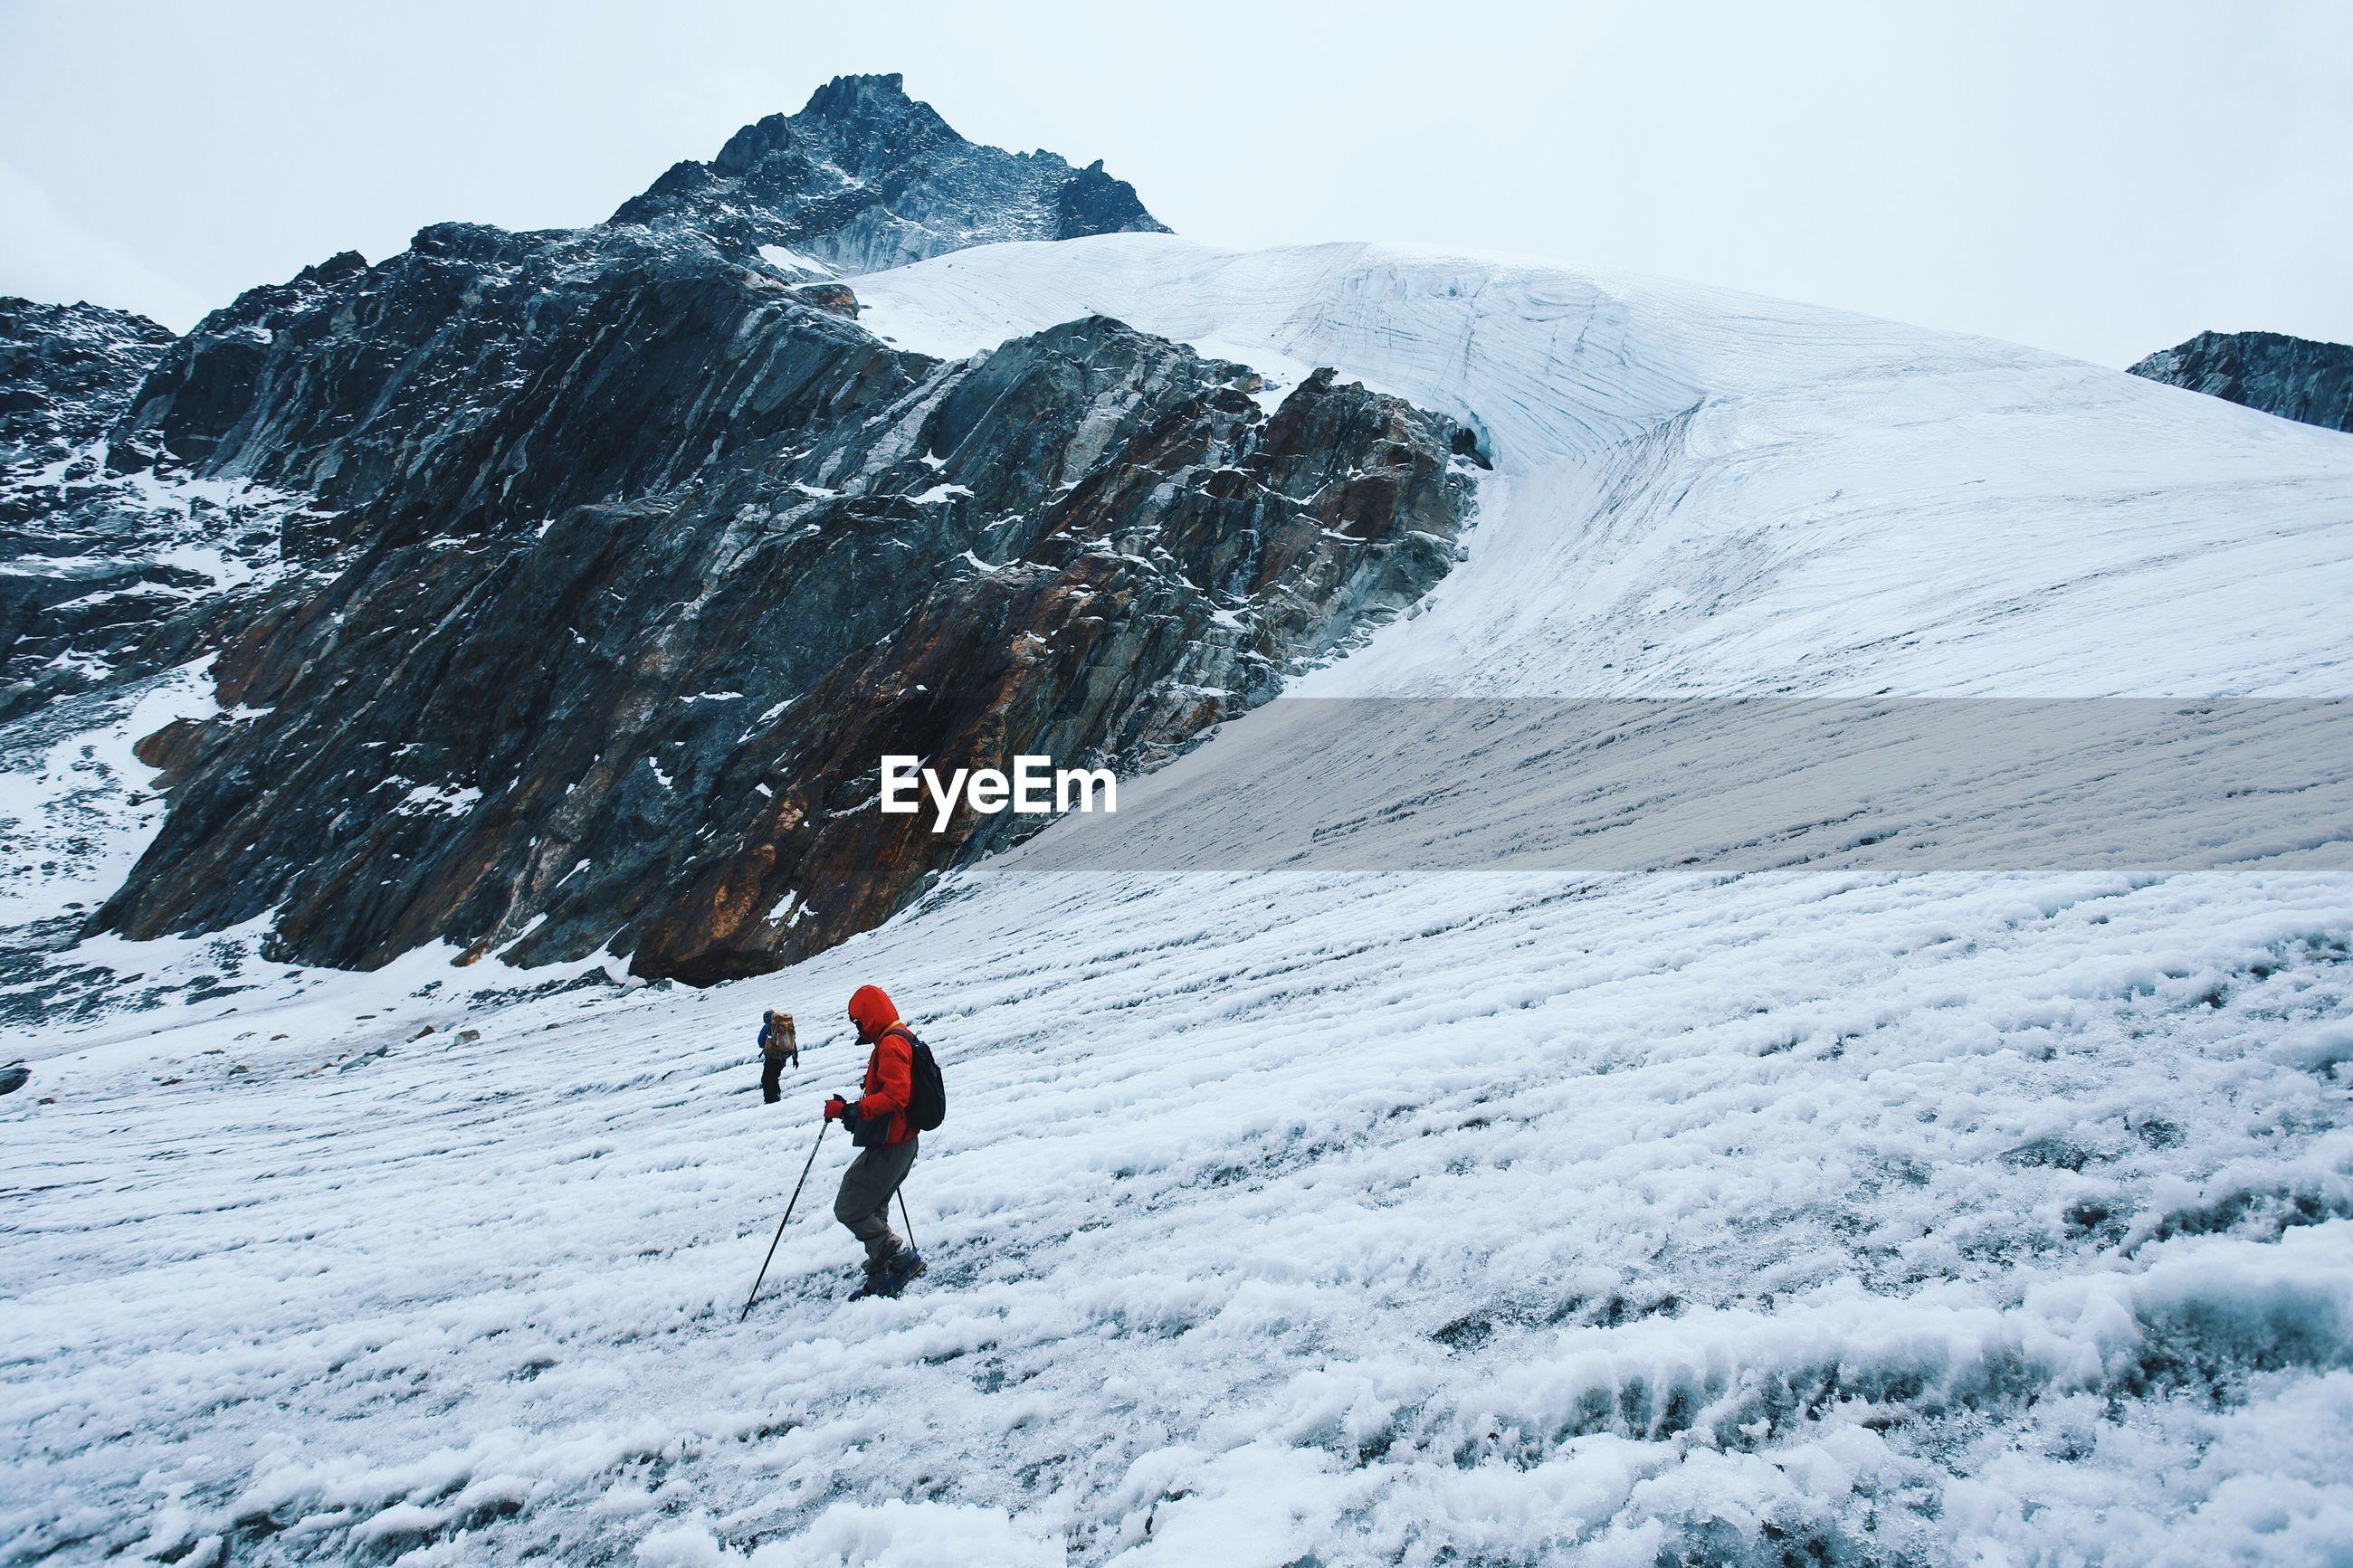 Man skiing on snow landscape